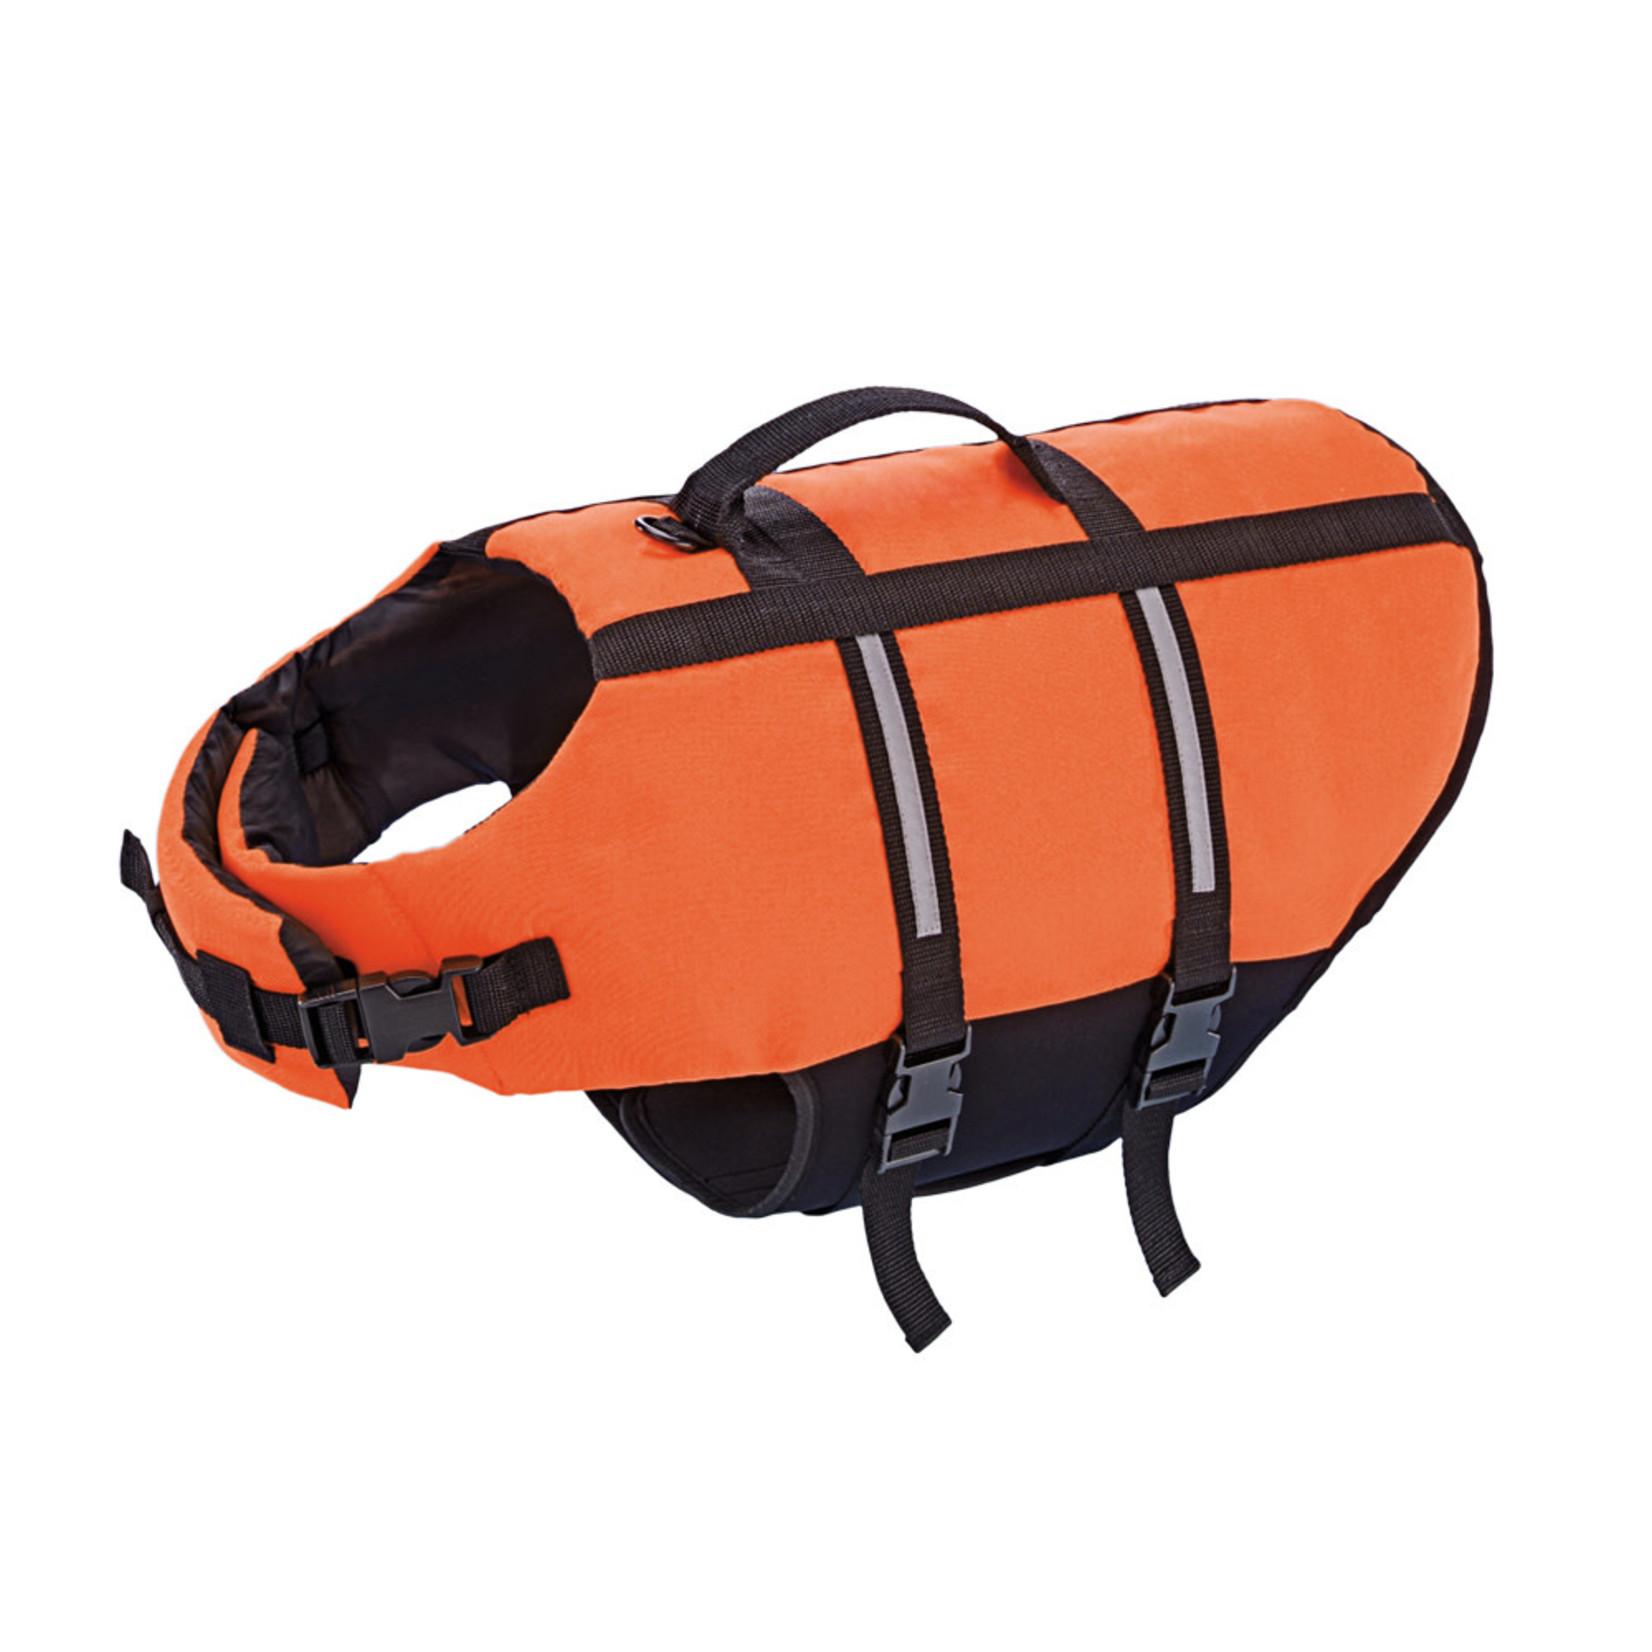 Nobby Dog Buoyancy Aid with Reflective Stripes, Neon Orange